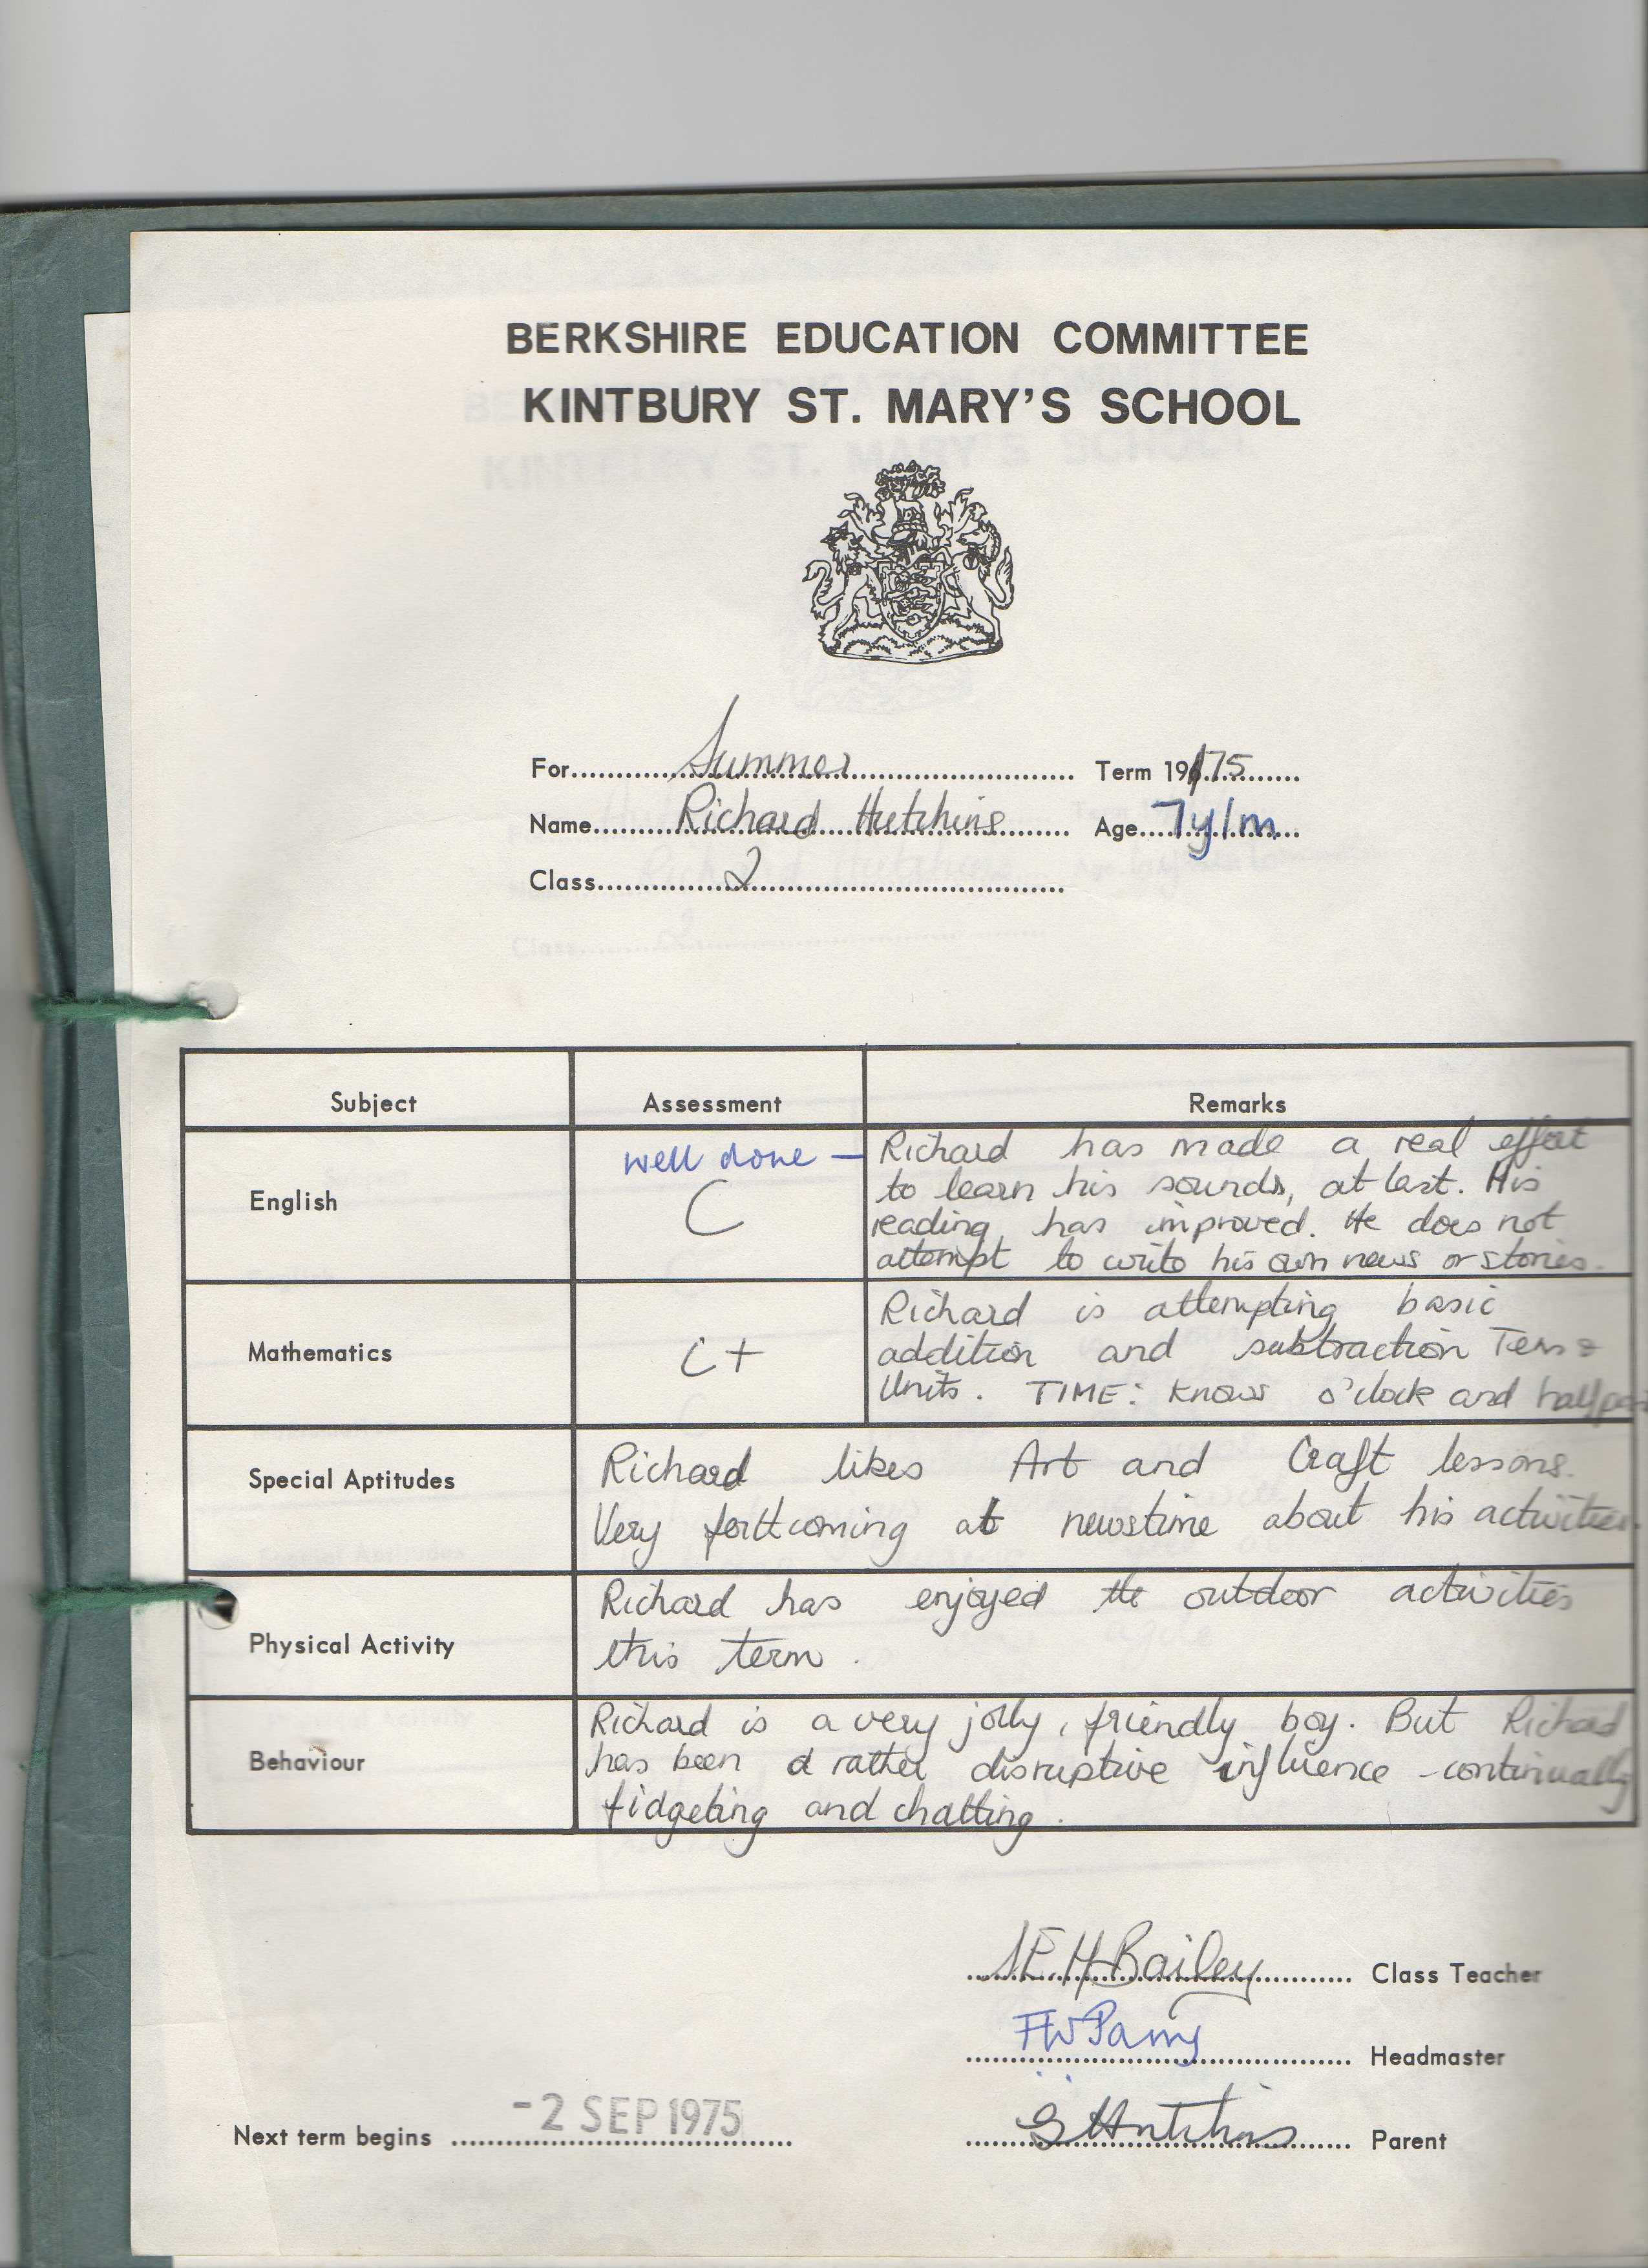 richard-school-report-summer-1975-kintbury